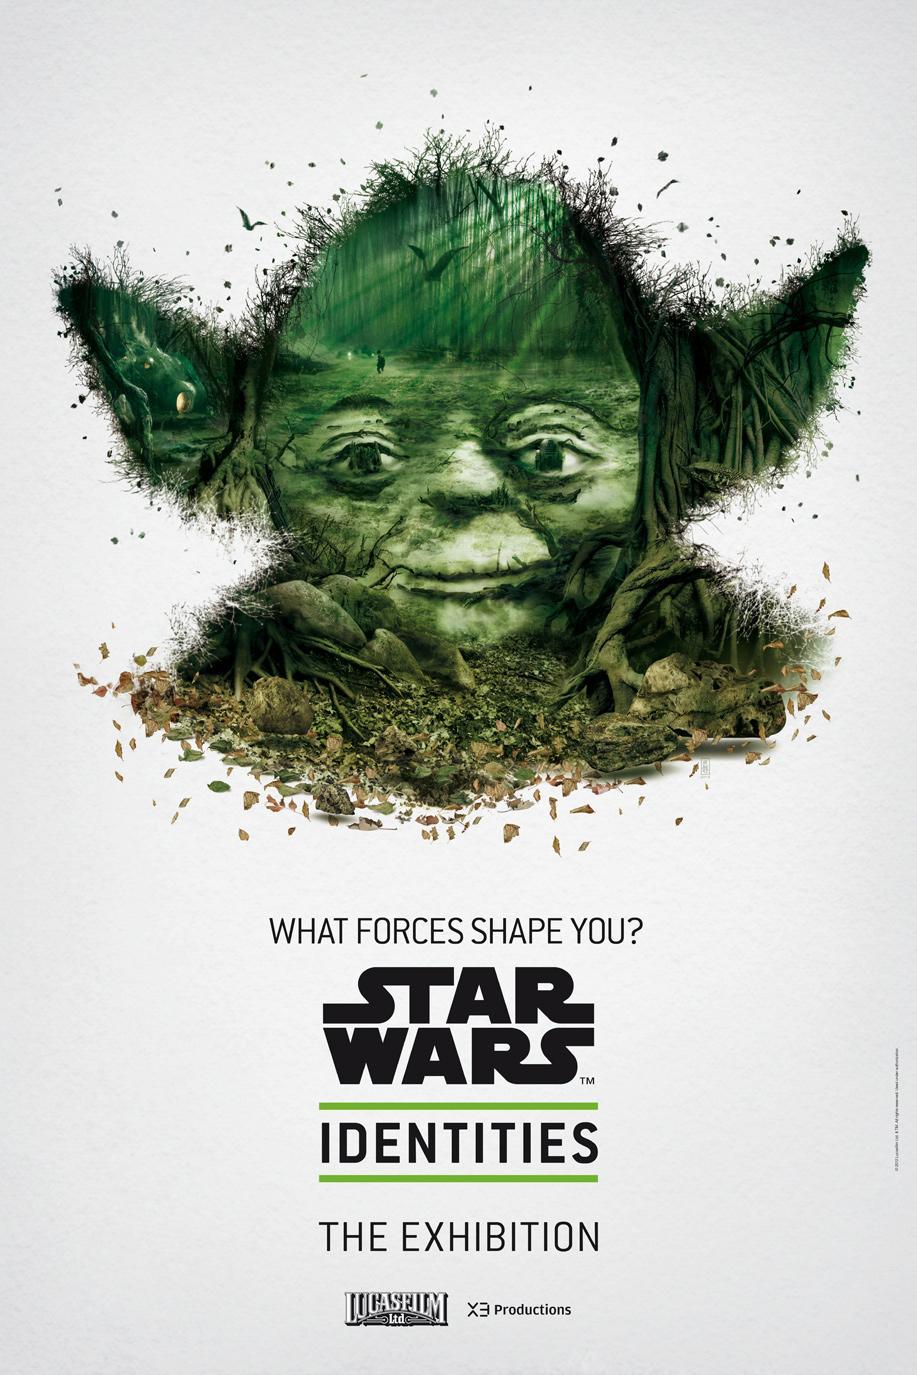 Star Wars Outdoor Ad -  The Exhibition, Yoda